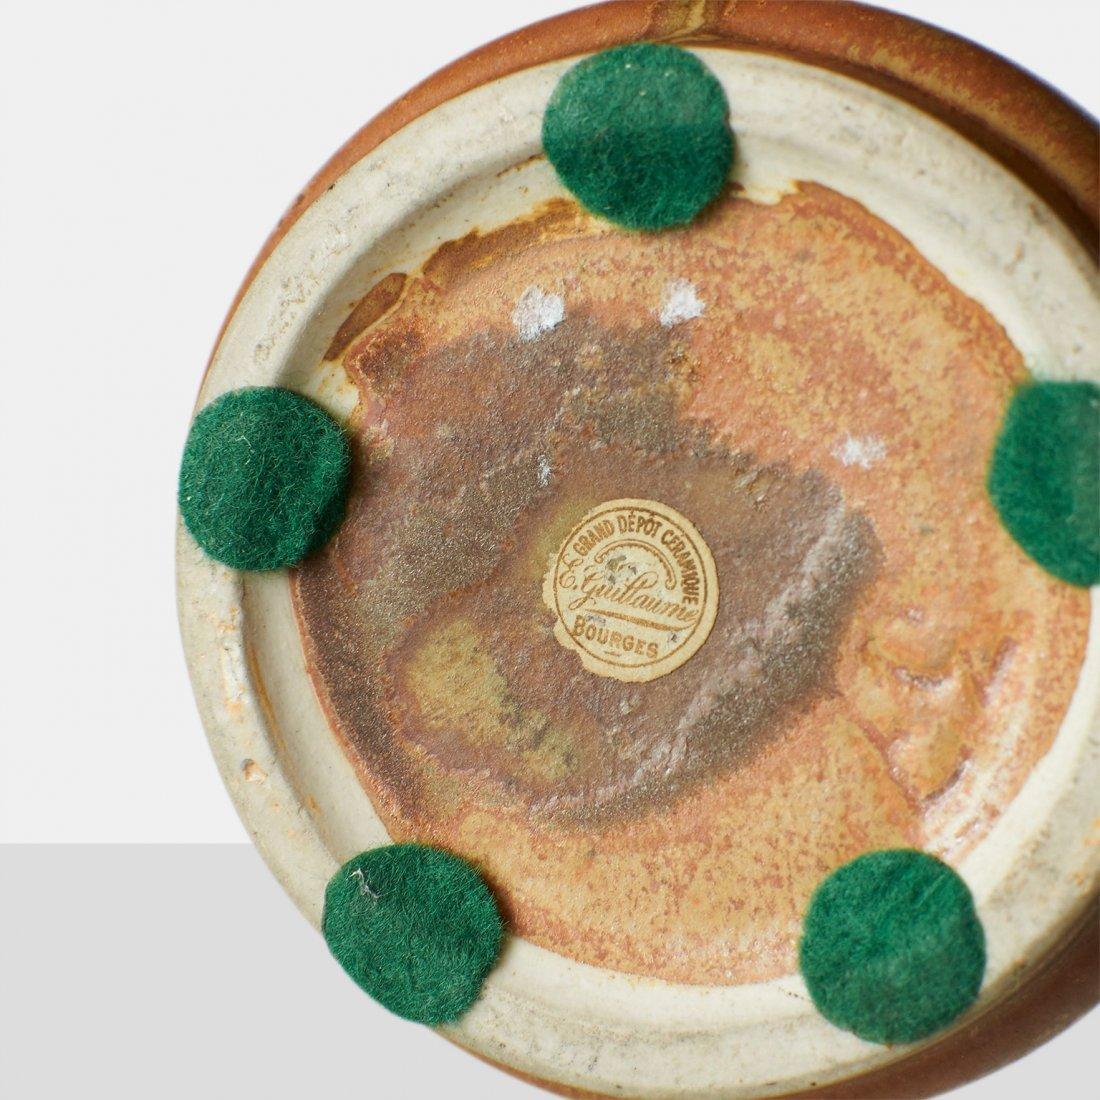 Guillaume Ceramics, Pair of Earthenware Vases - 5